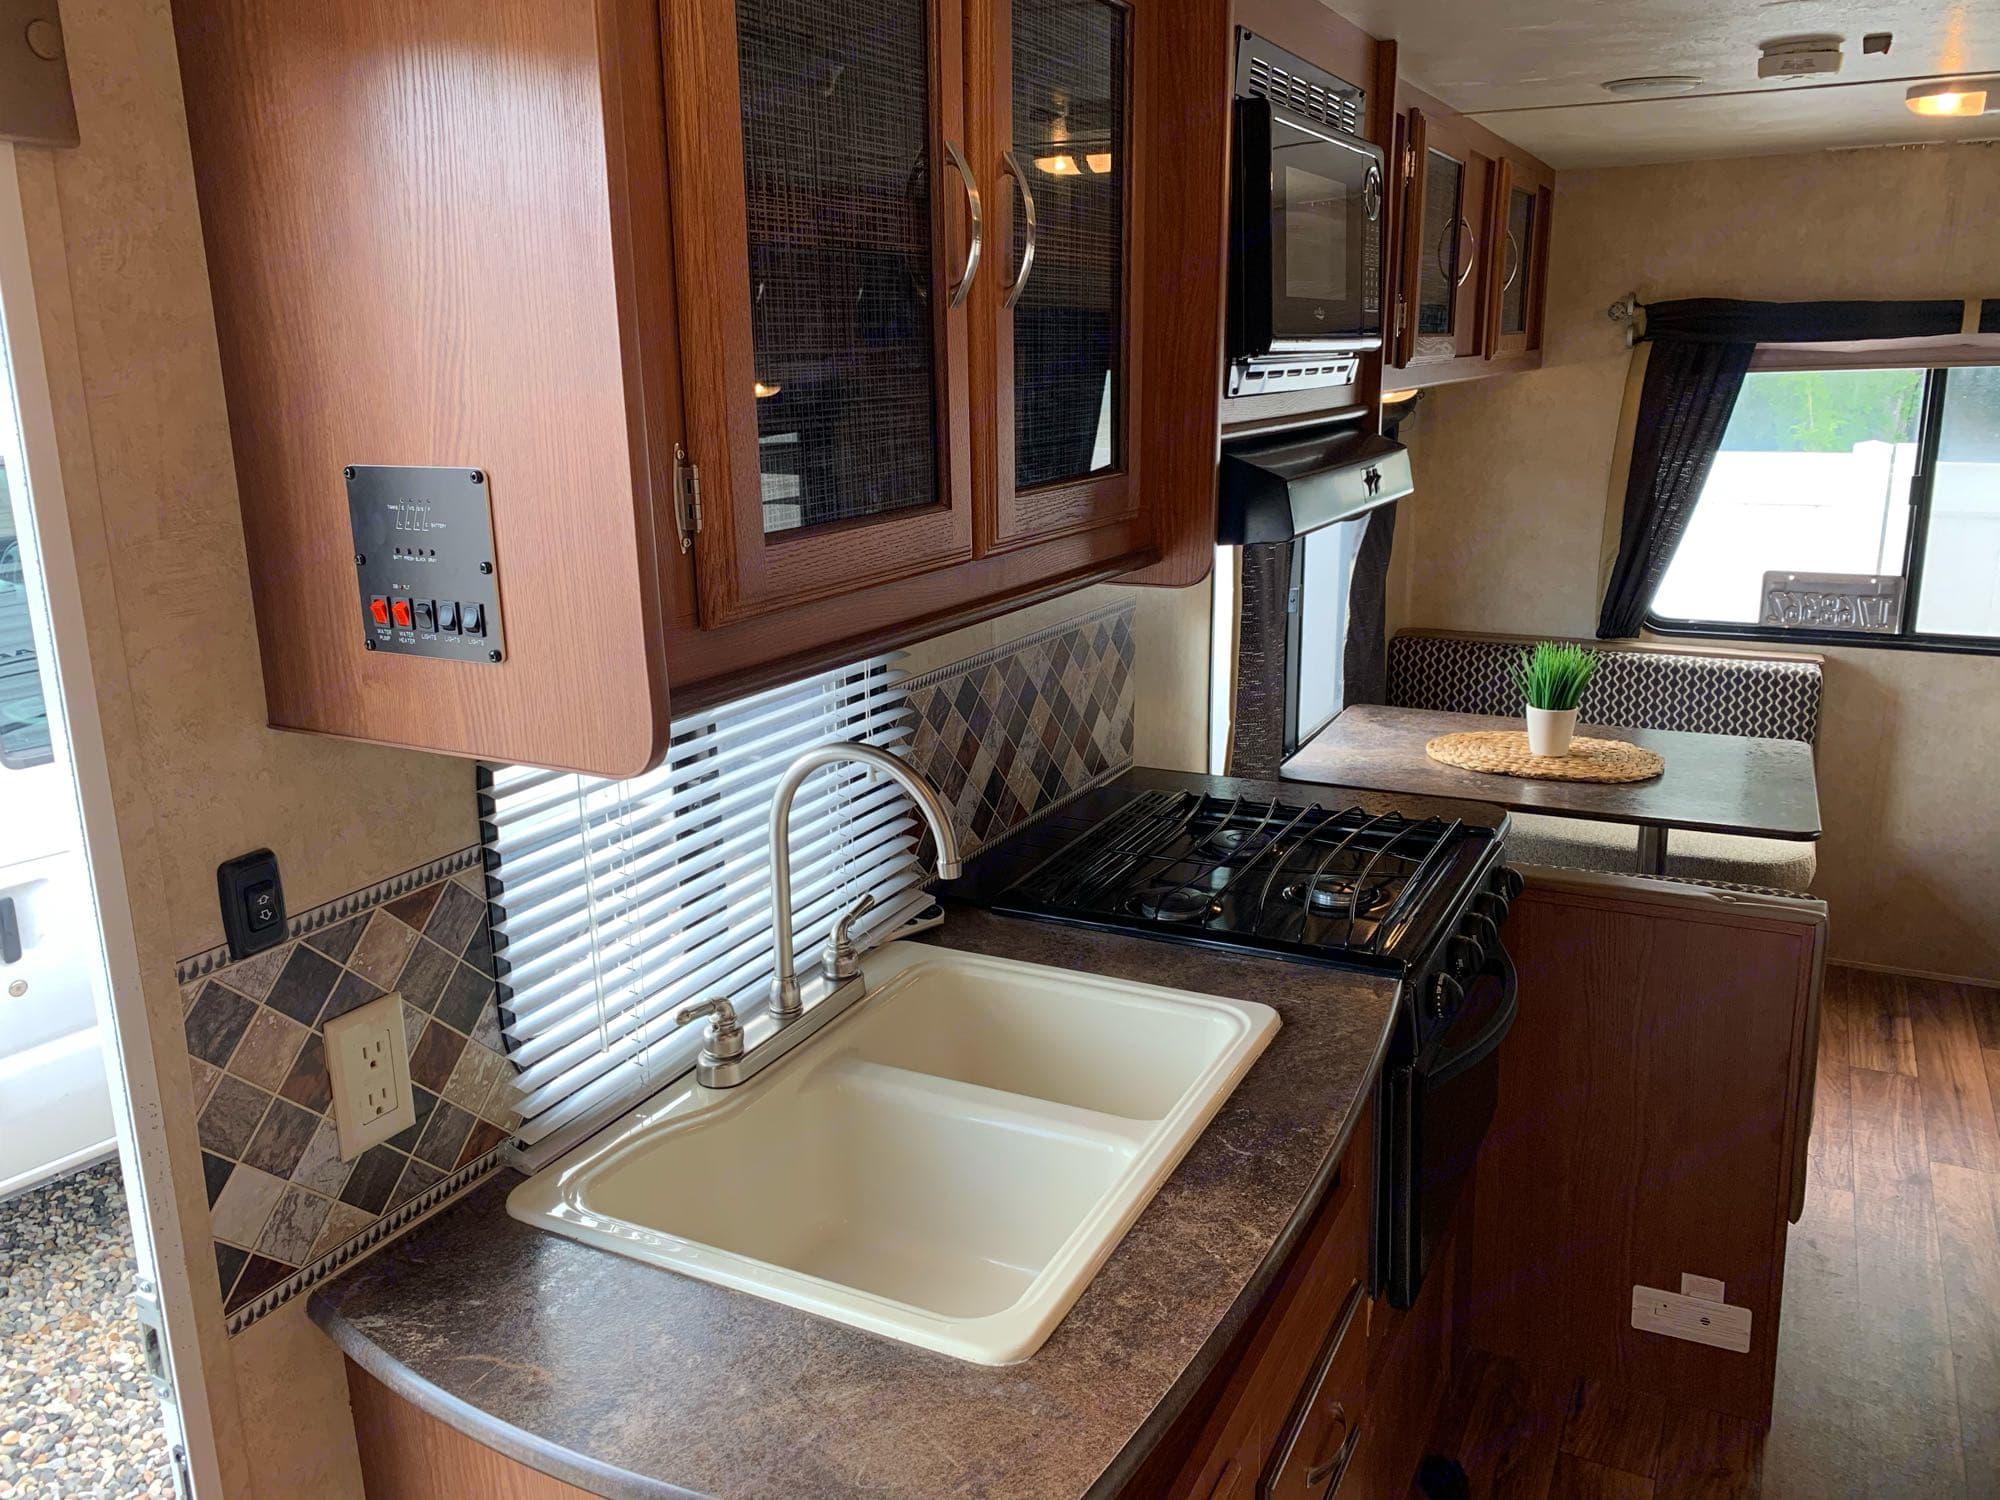 sink, range, lighting and pump controls. Forest River Salem Cruise Lite 2016